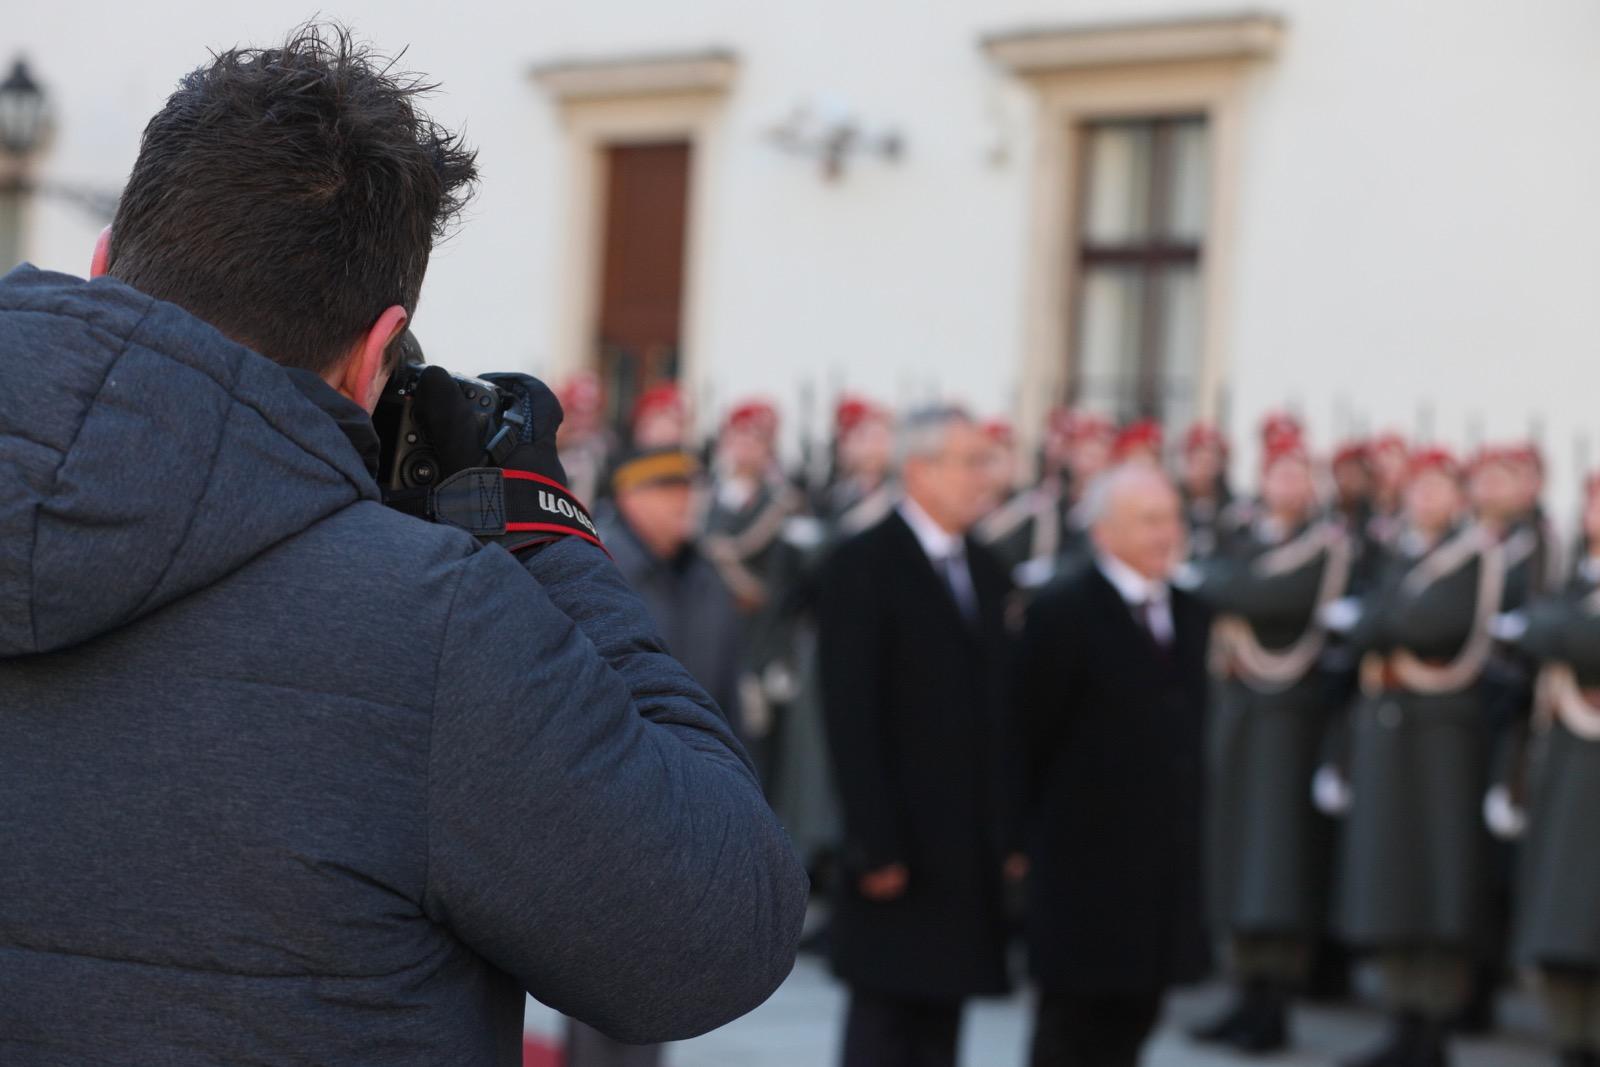 2019_01_11_1Gardekompanie_HBP_SUI_Präsident_Schweiz_Burghof - 27 of 36